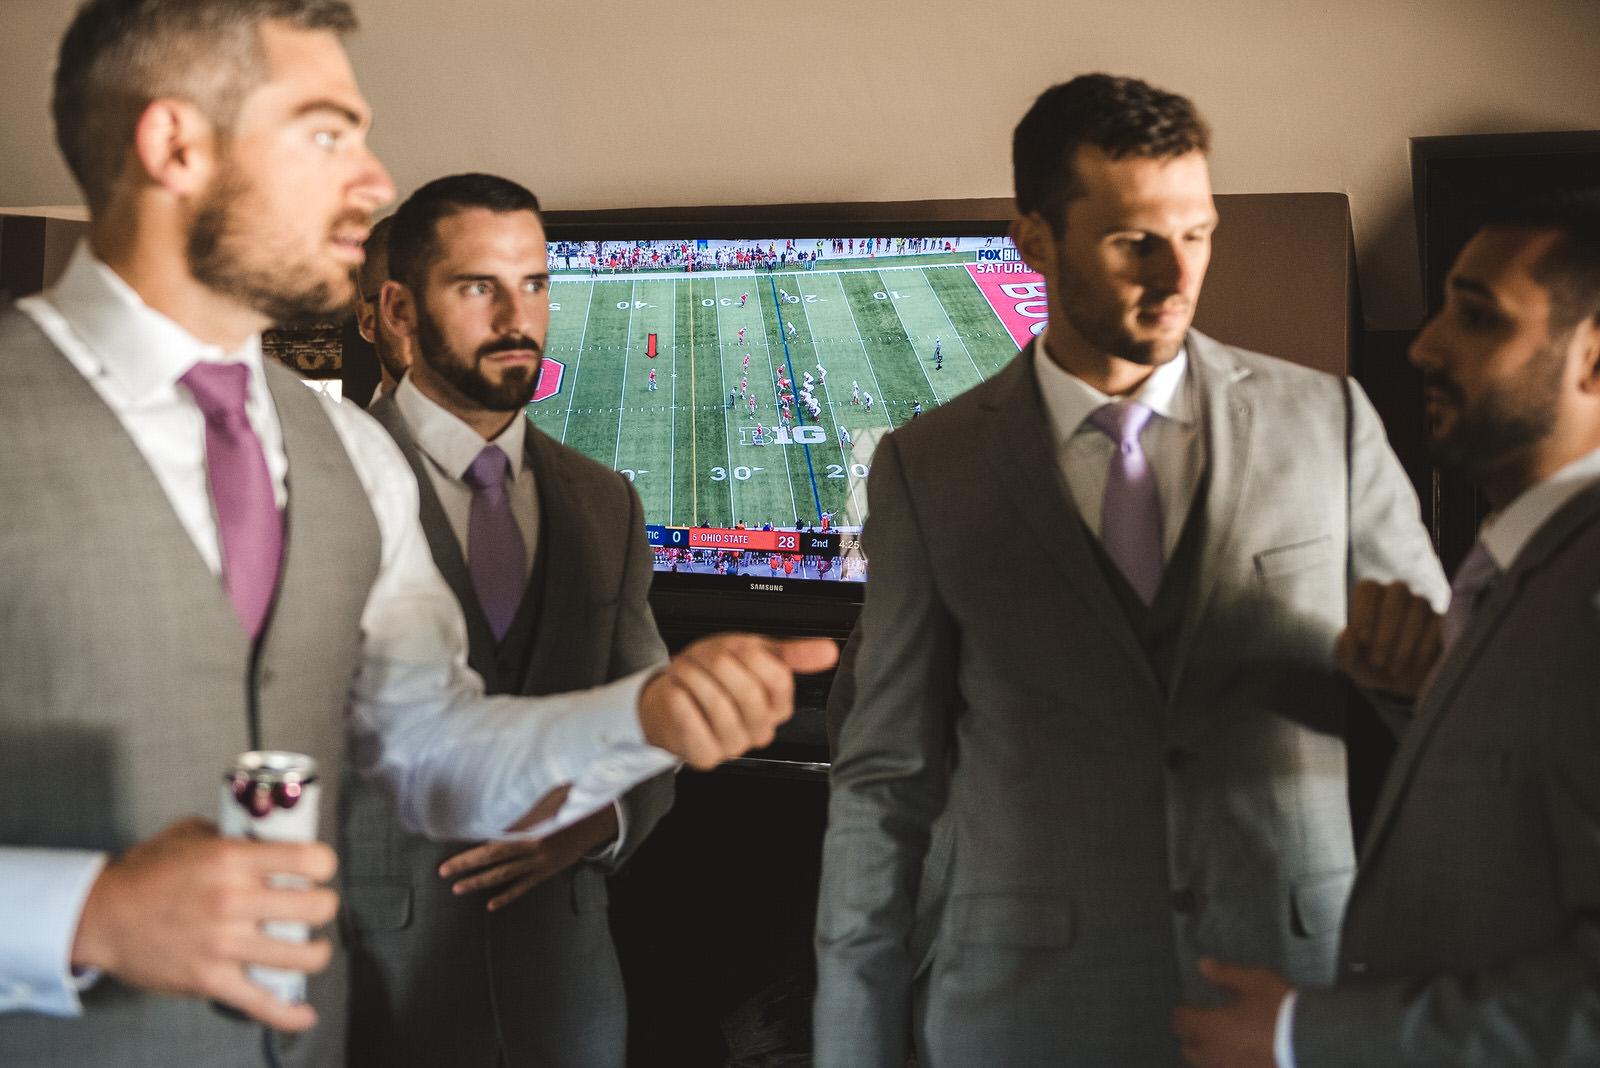 football game on at wedding